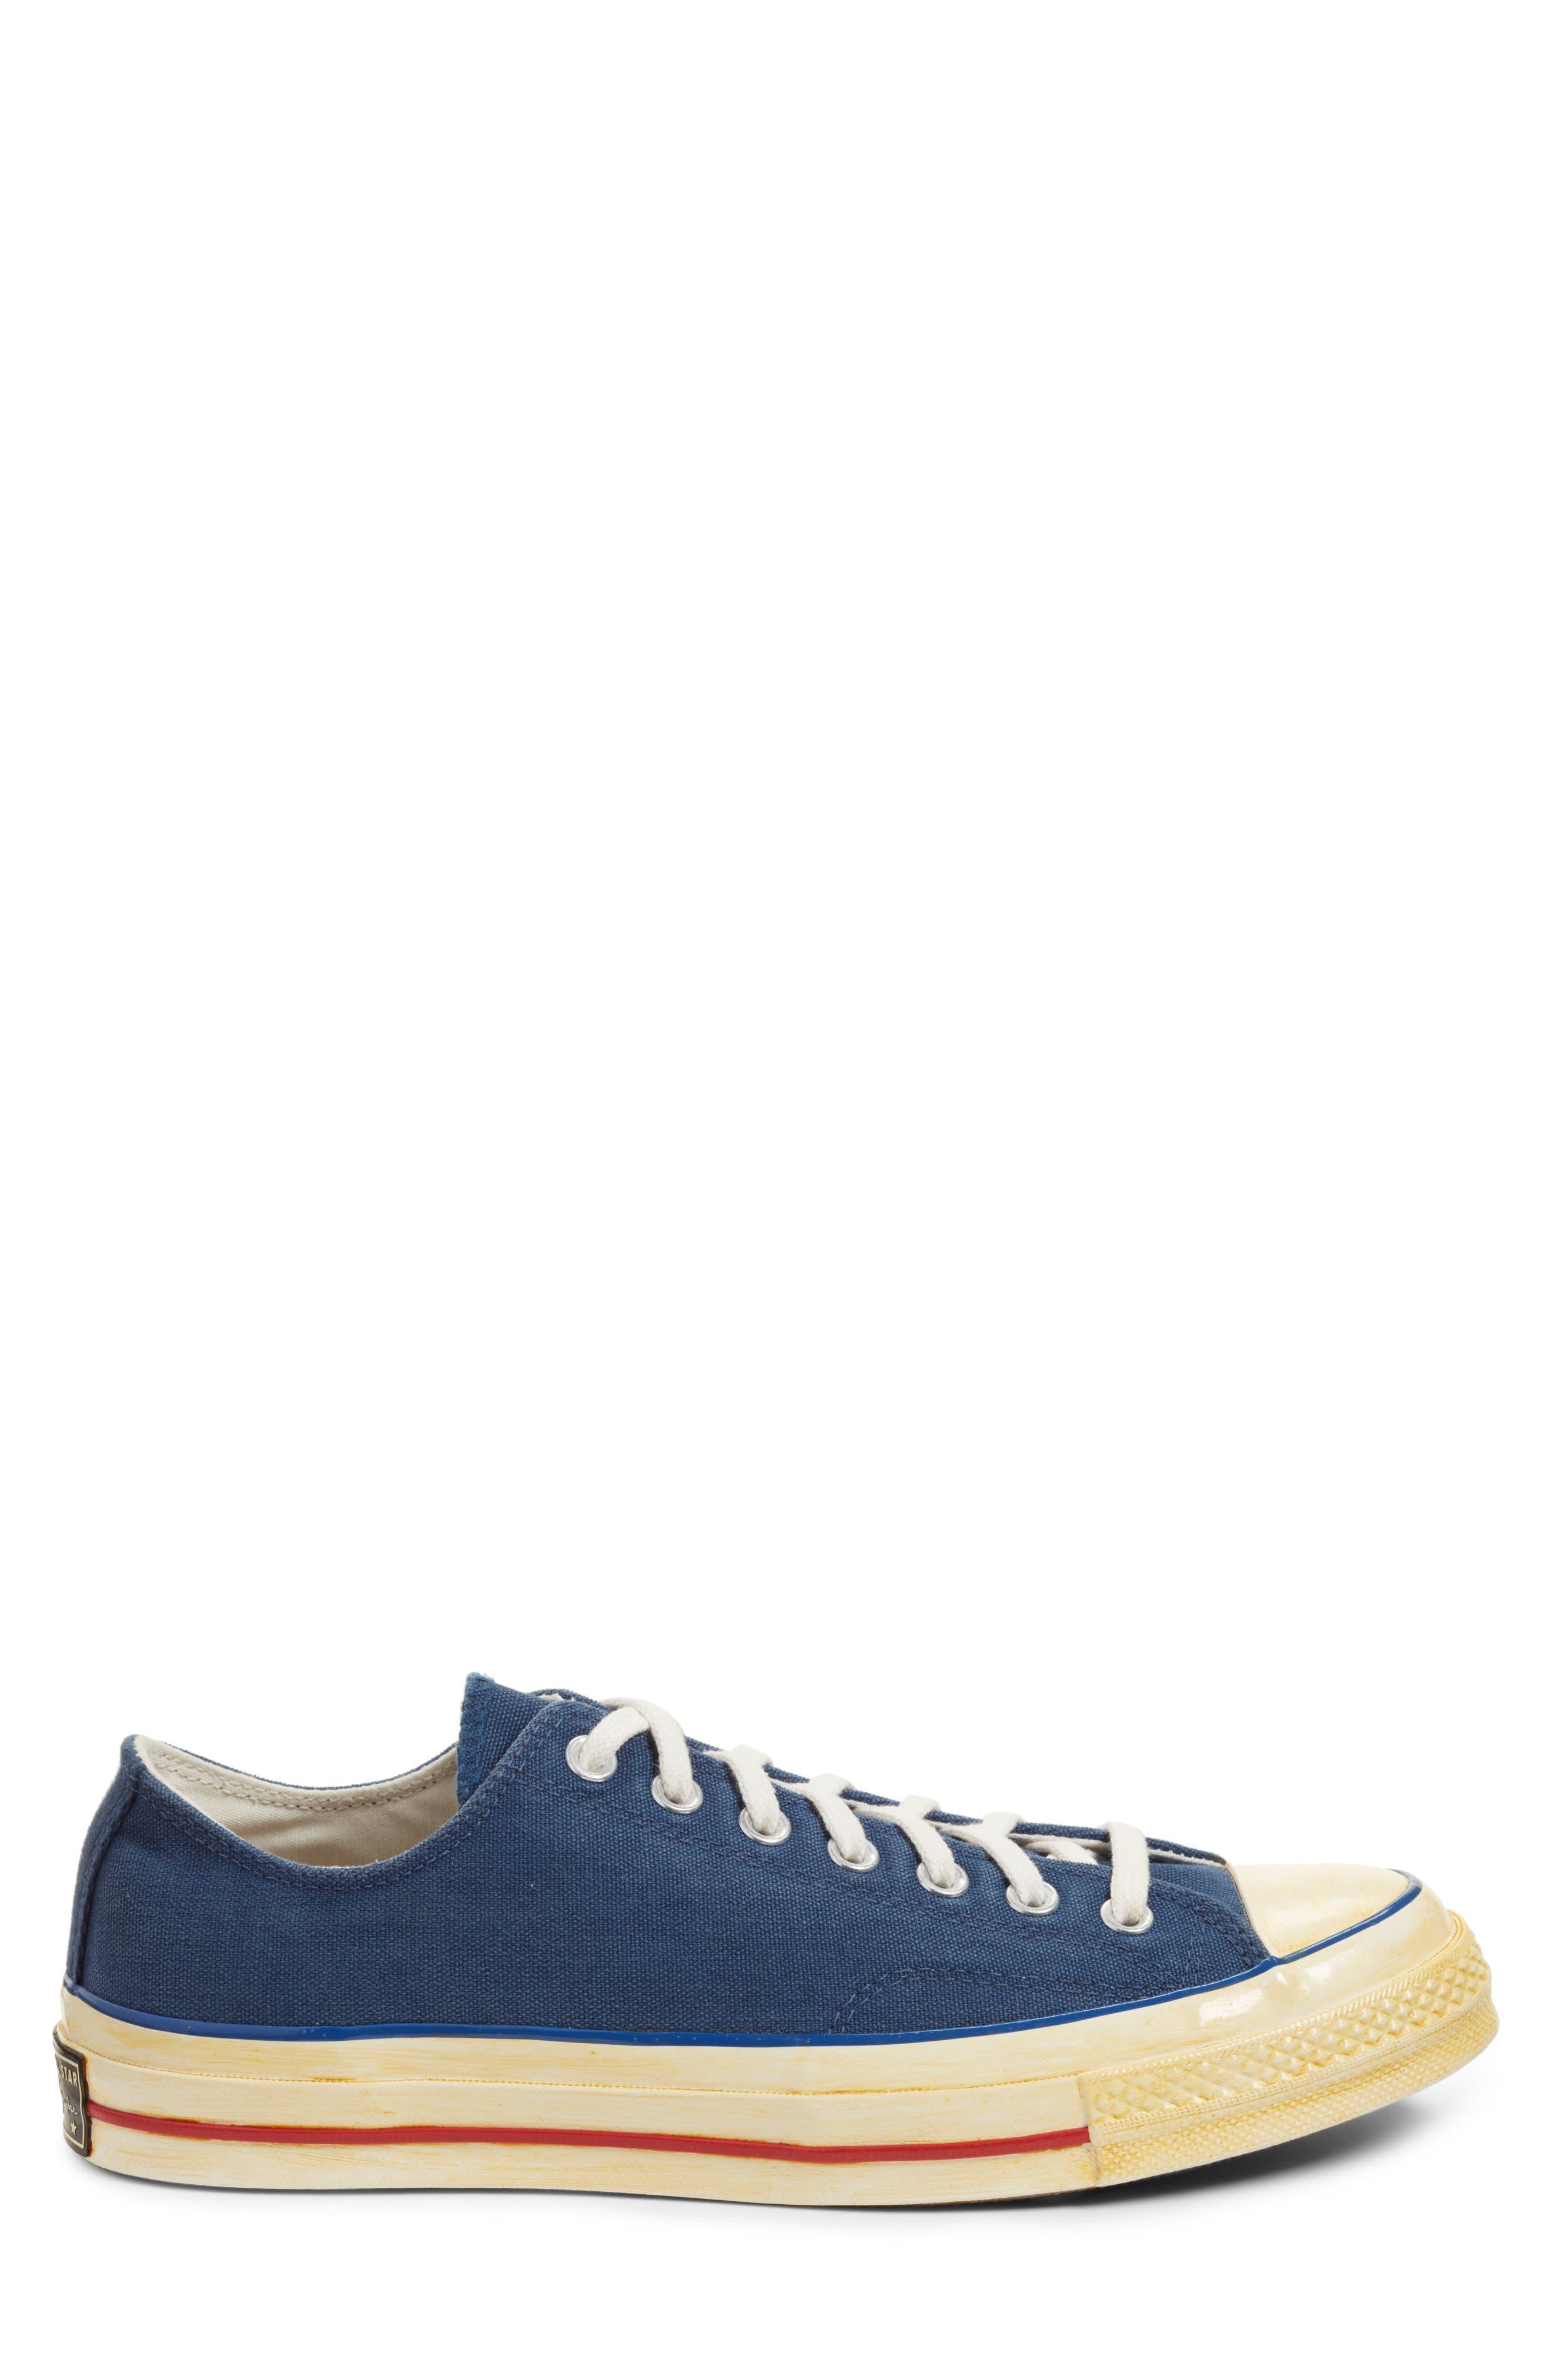 Alternate Image 3  - Converse Chuck Taylor® All Star® 70 Low Top Sneaker (Men)